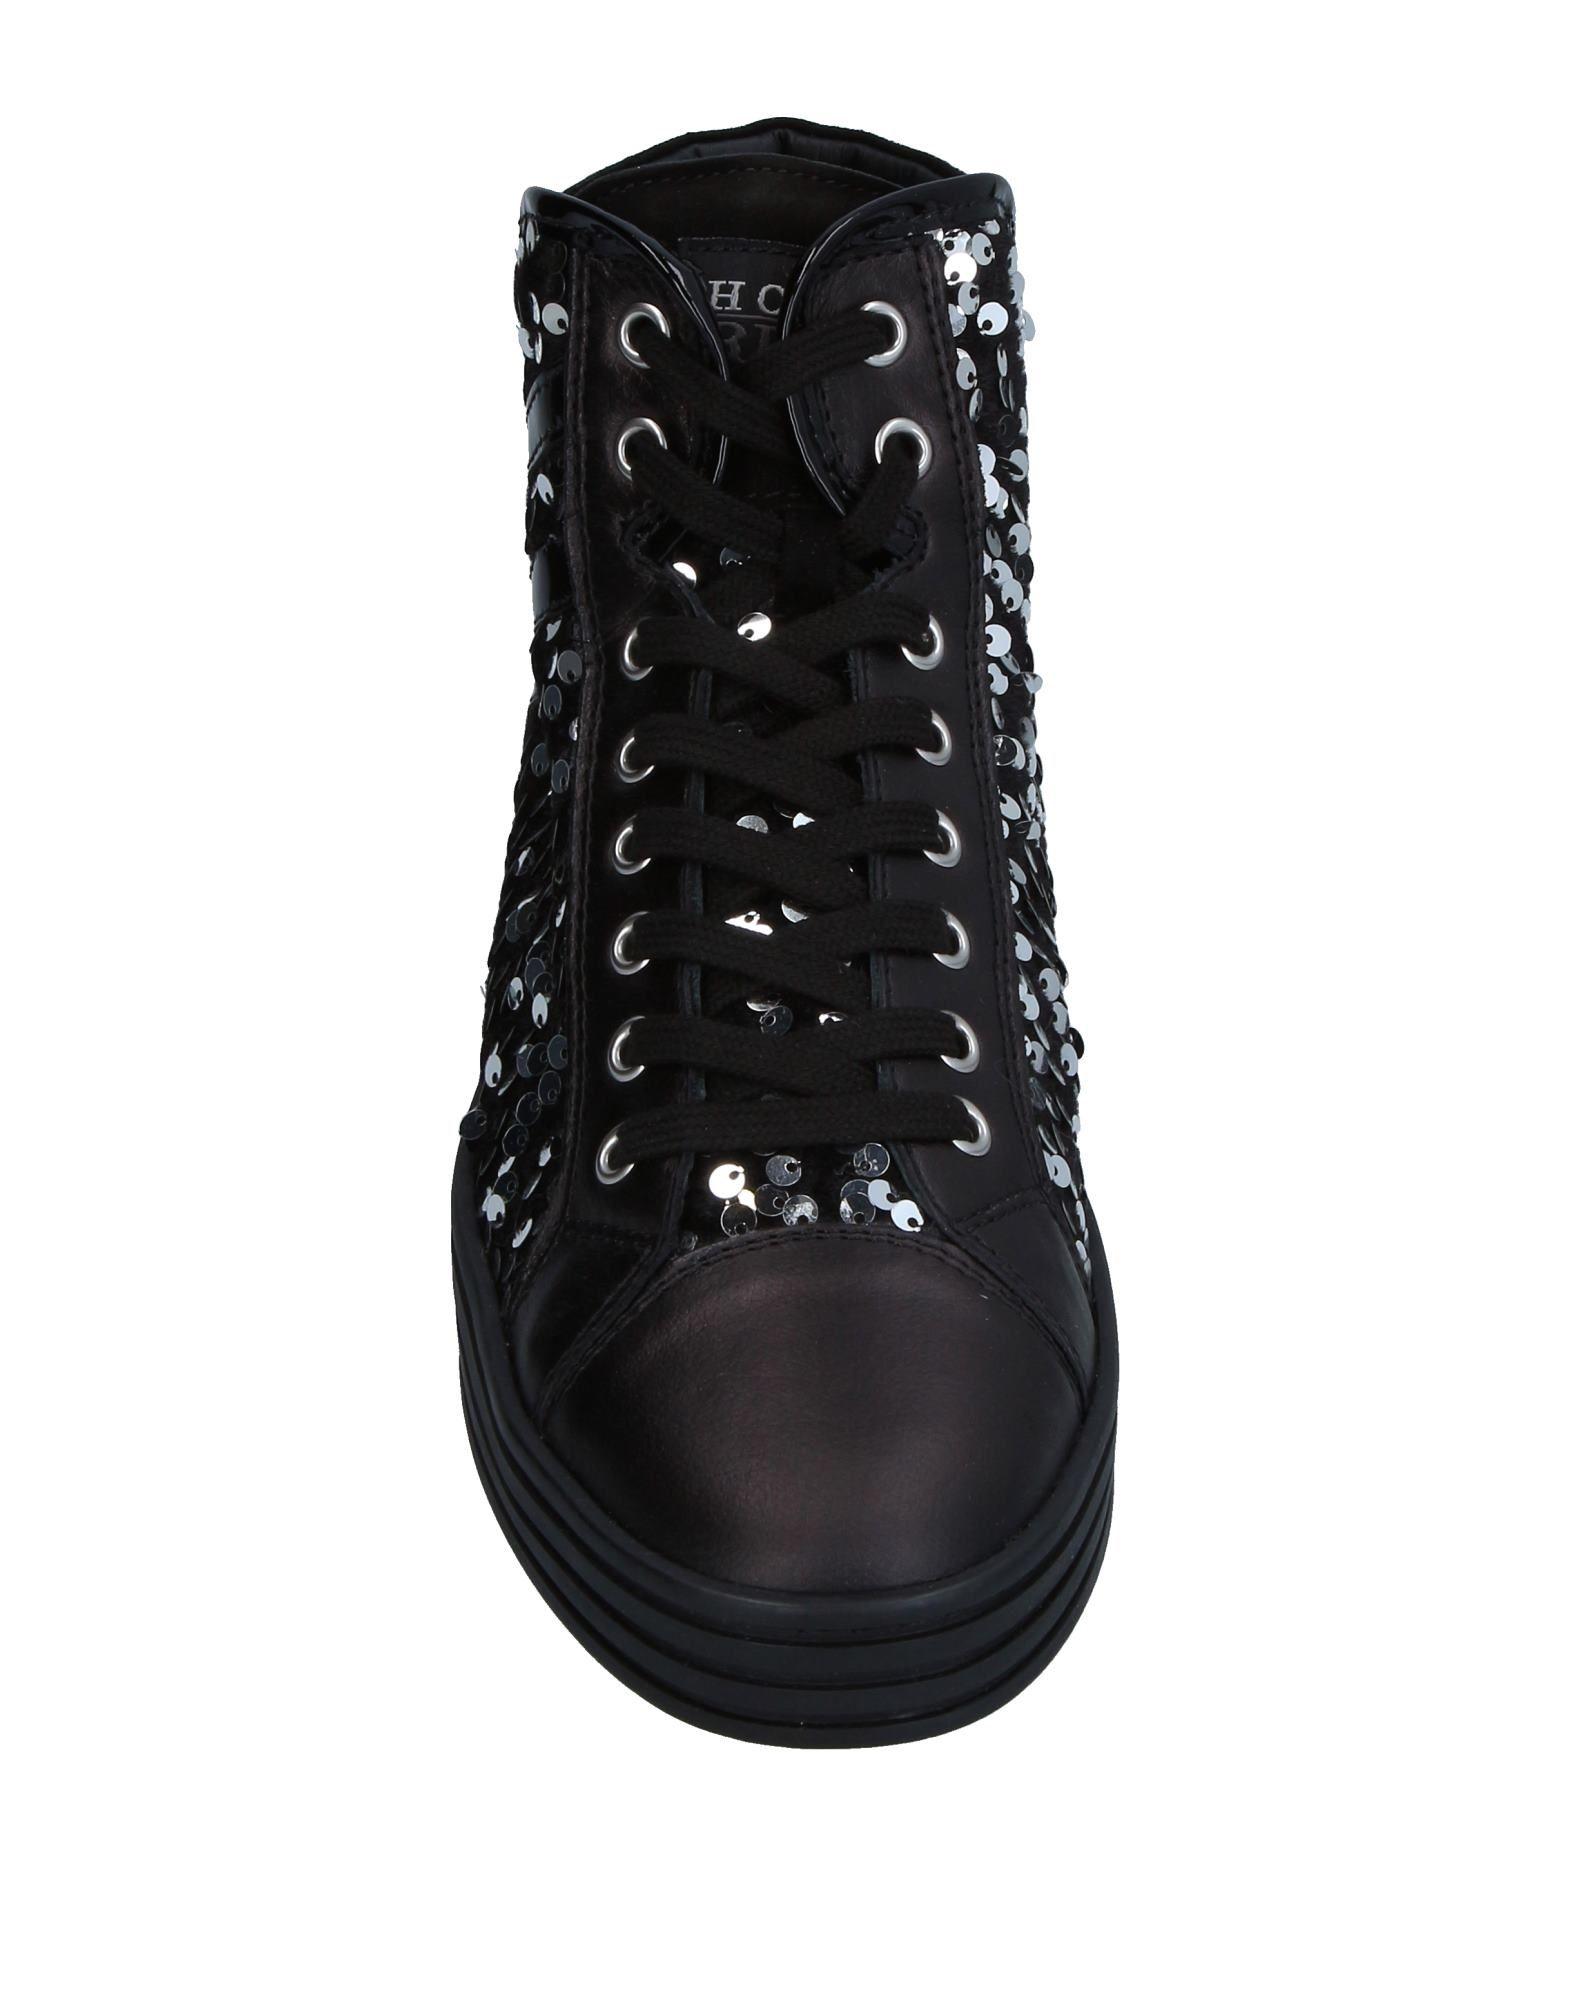 Hogan Rebel Sneakers Damen strapazierfähige  11299916VRGut aussehende strapazierfähige Damen Schuhe ae214e